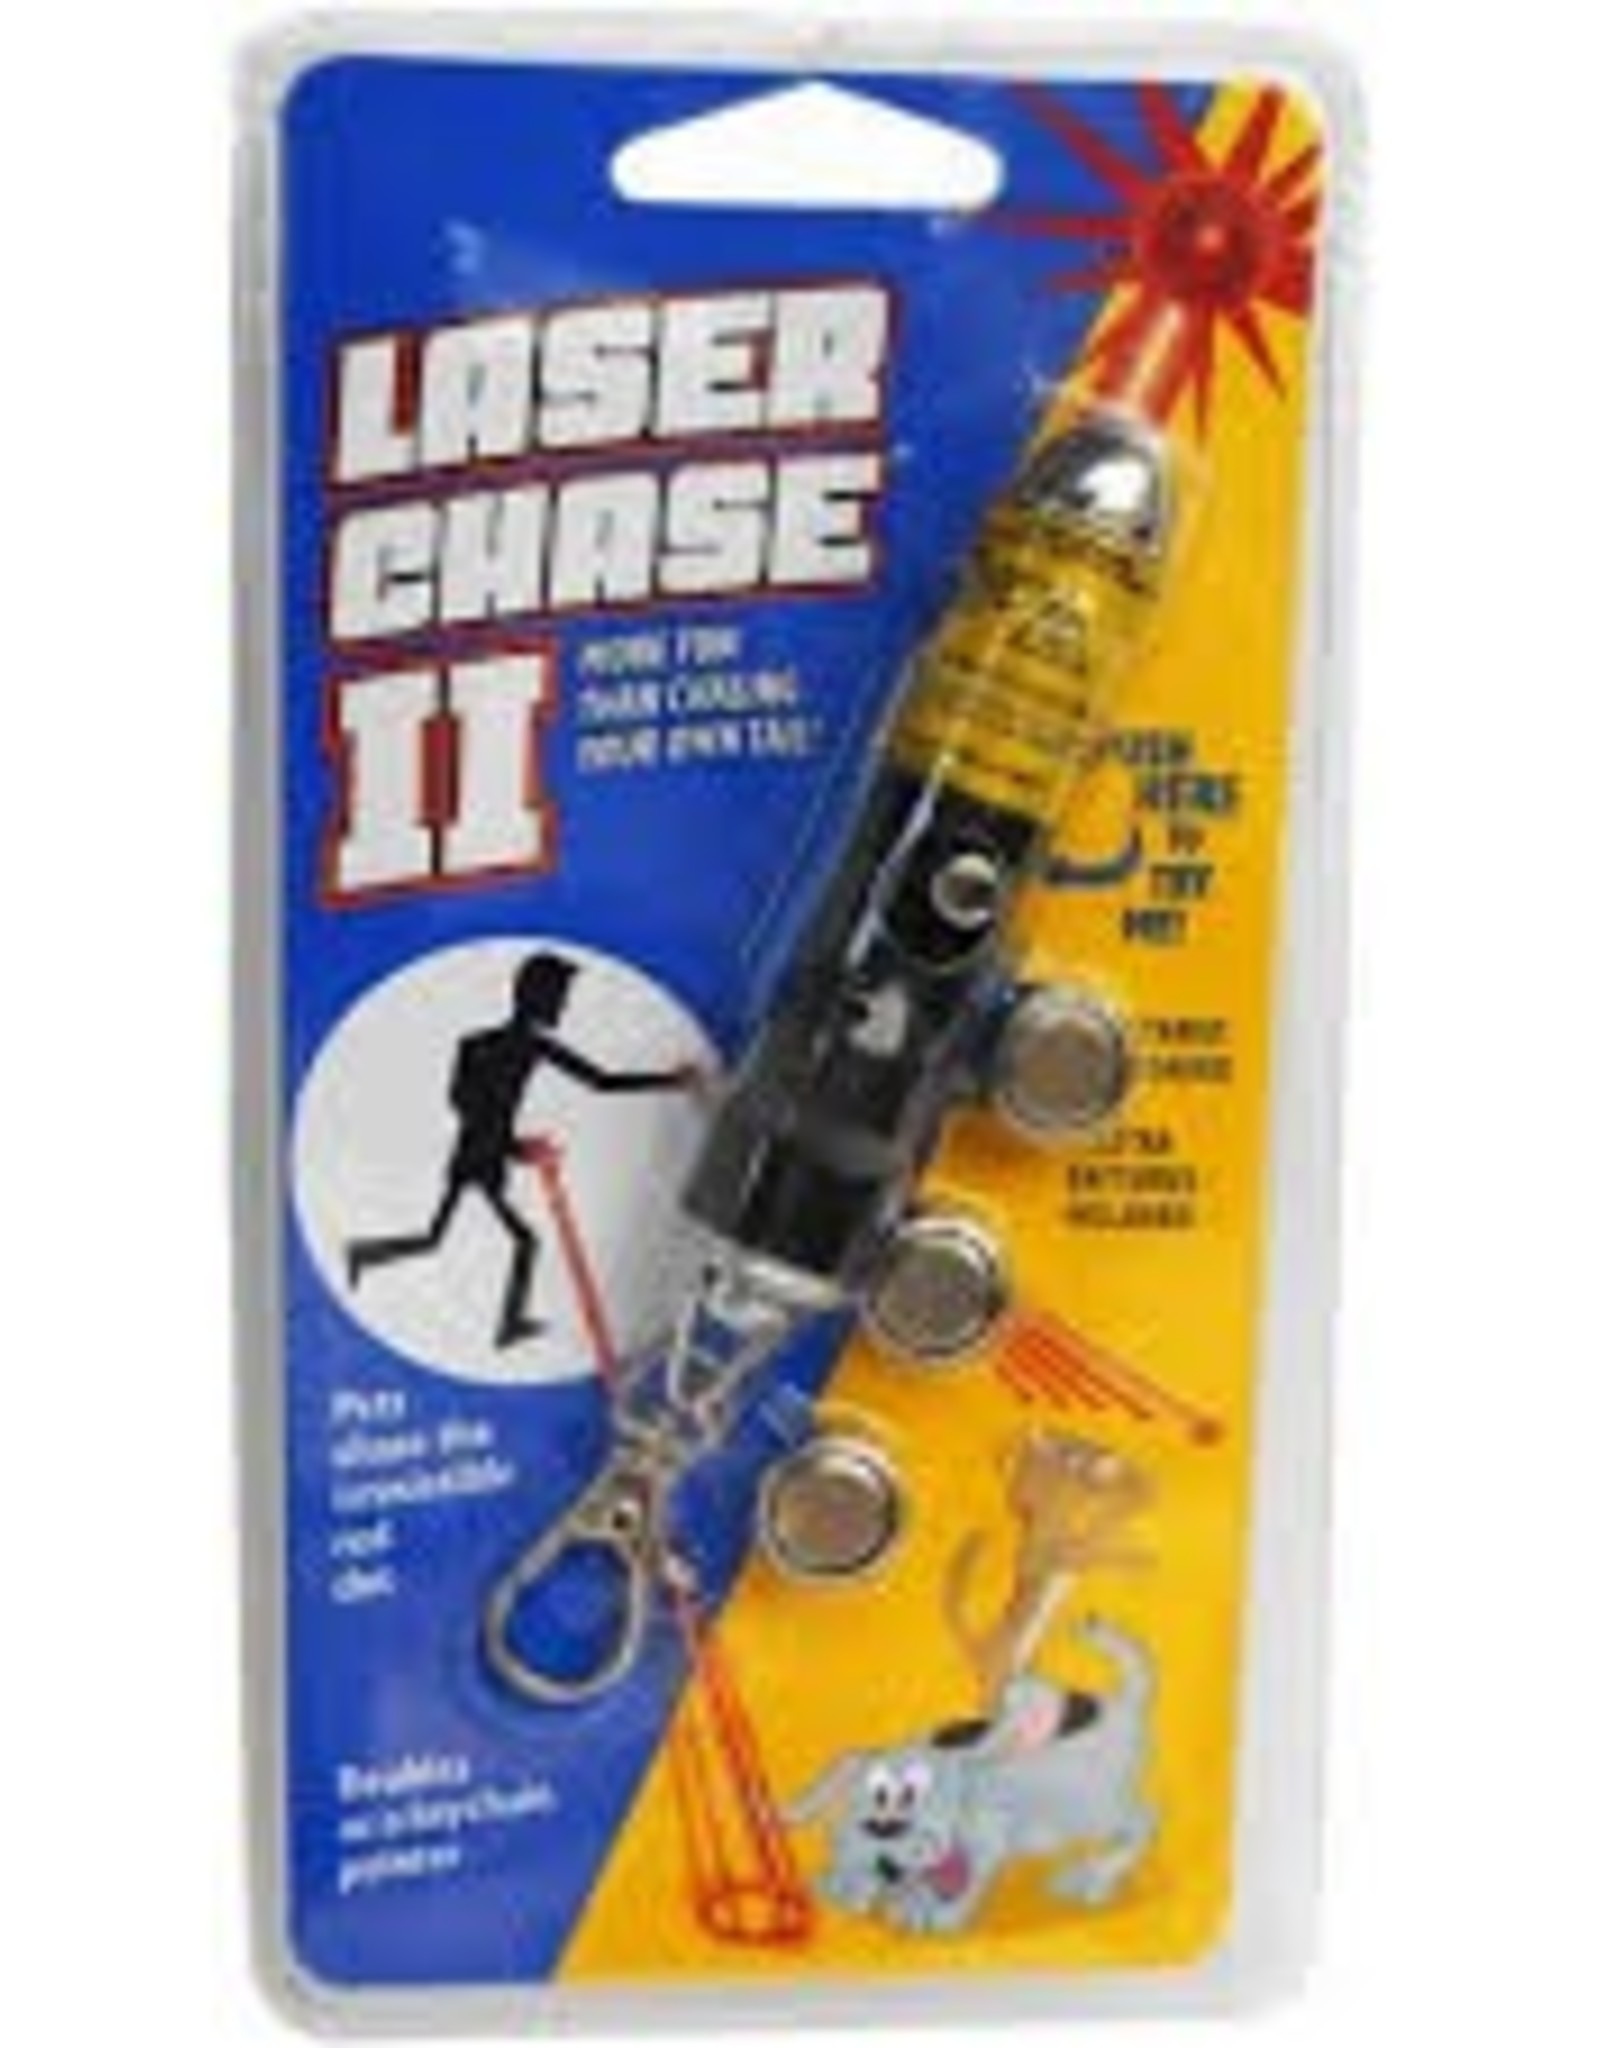 PetSport Cat Laser Chase II